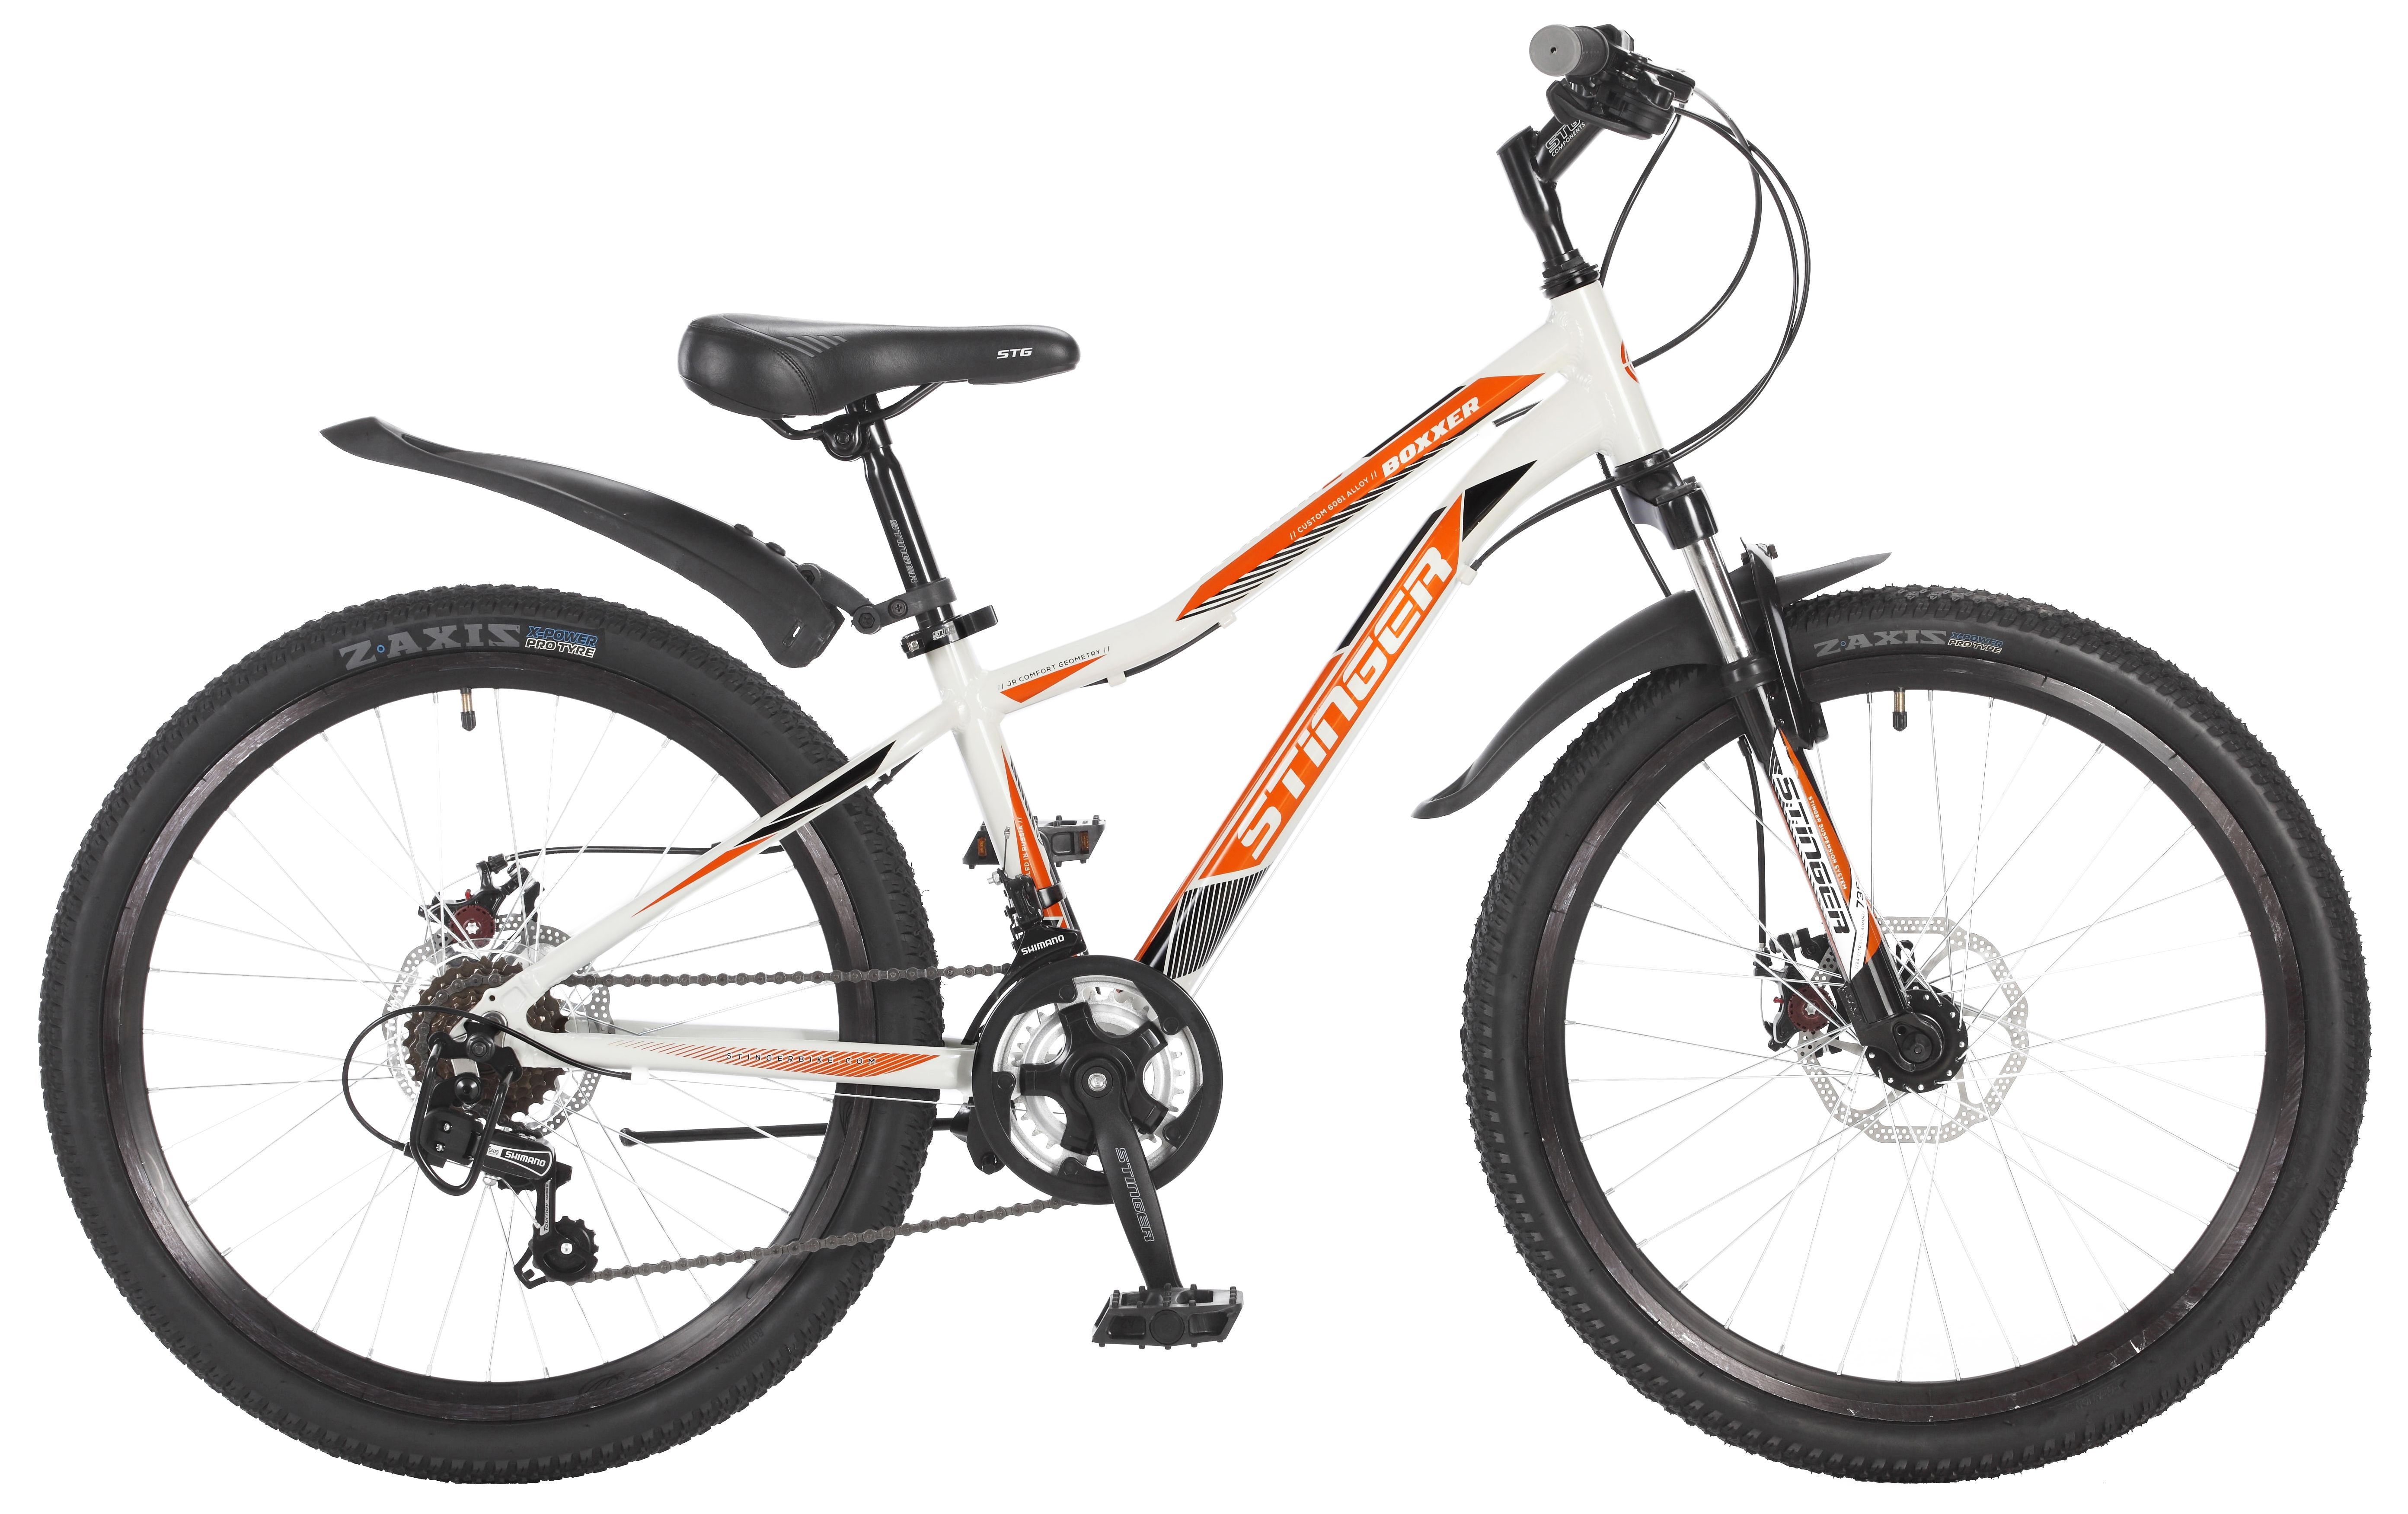 Велосипед Stinger Boxxer D 24 2017 велосипед stinger galaxy 24 2016